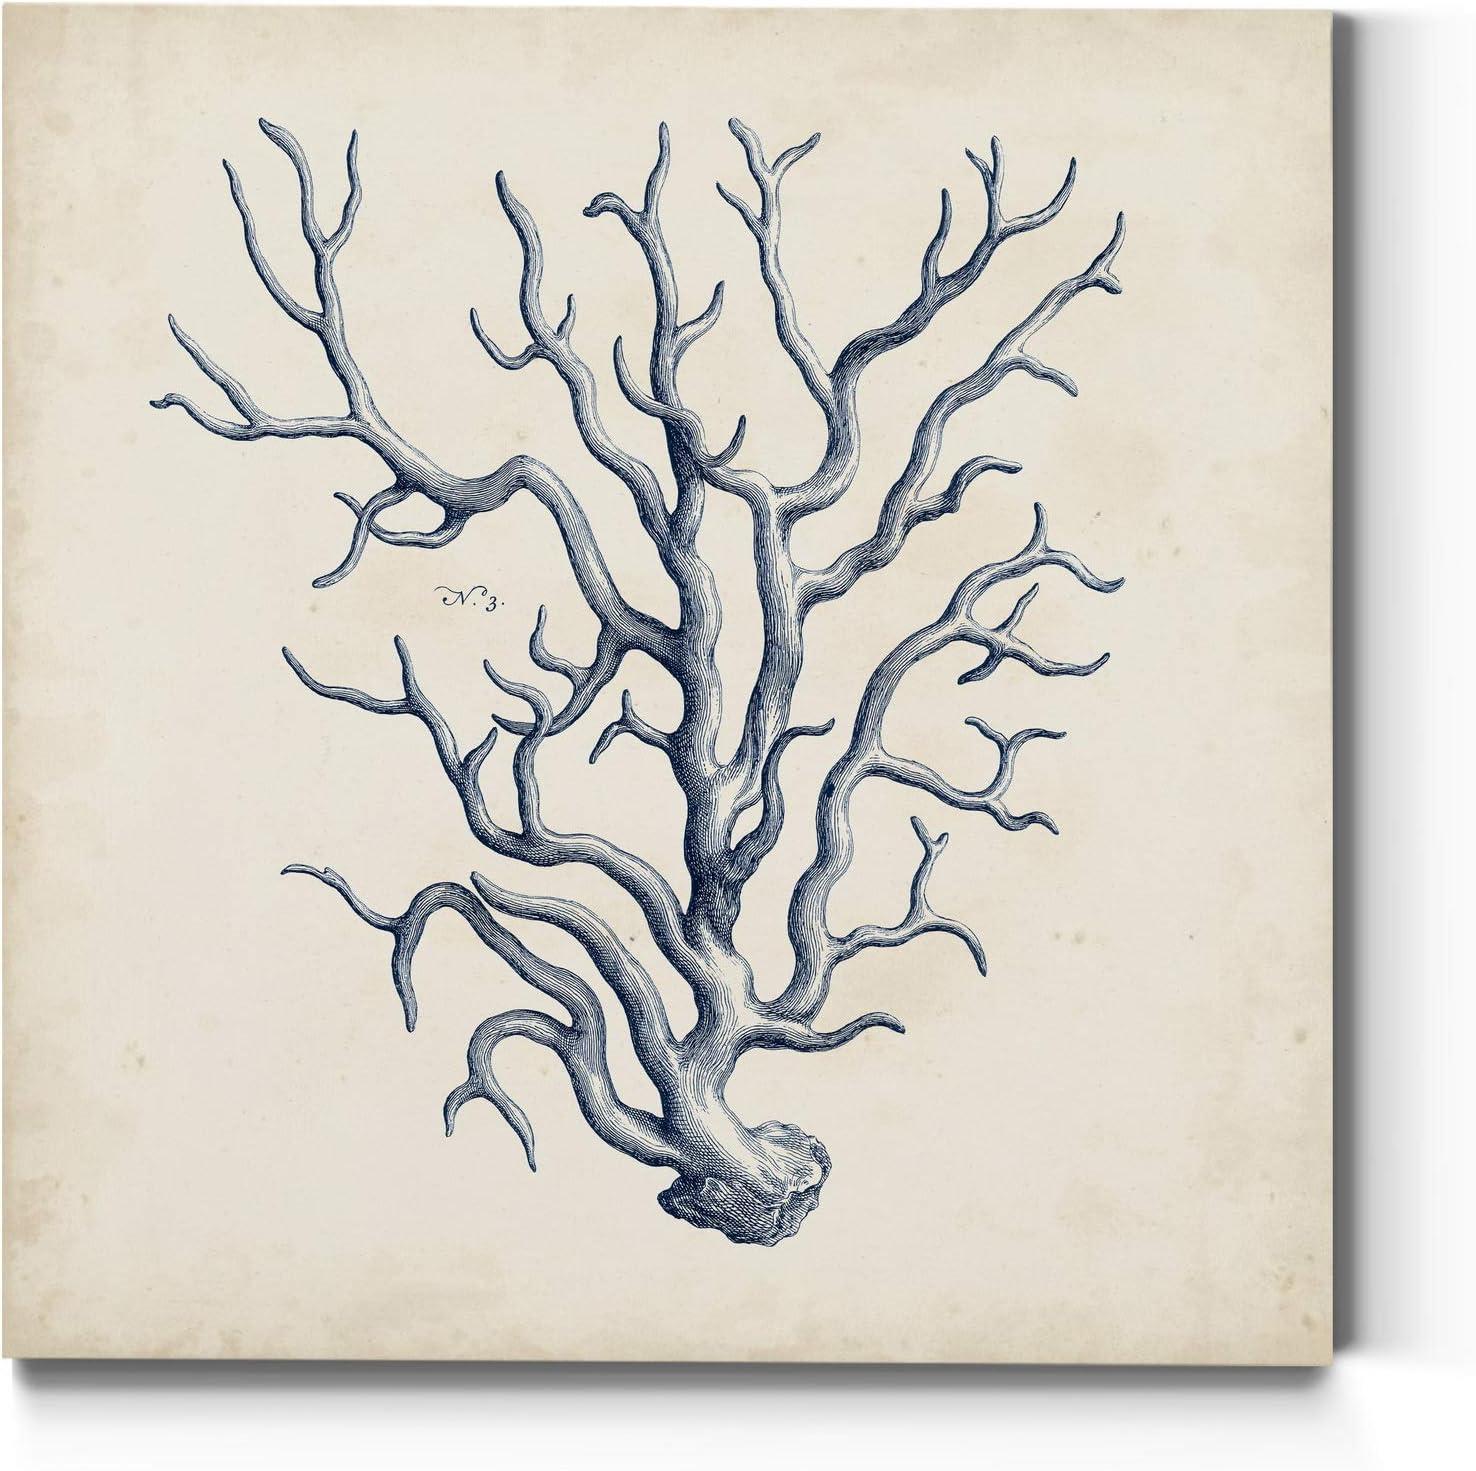 Neutral Color Wall Art, Wall Décor Canvas, Beaches, Floral, Animals, Bohemian, & Vintage Styles, Ready to Hang -Coral Trio in Indigo III 10X10